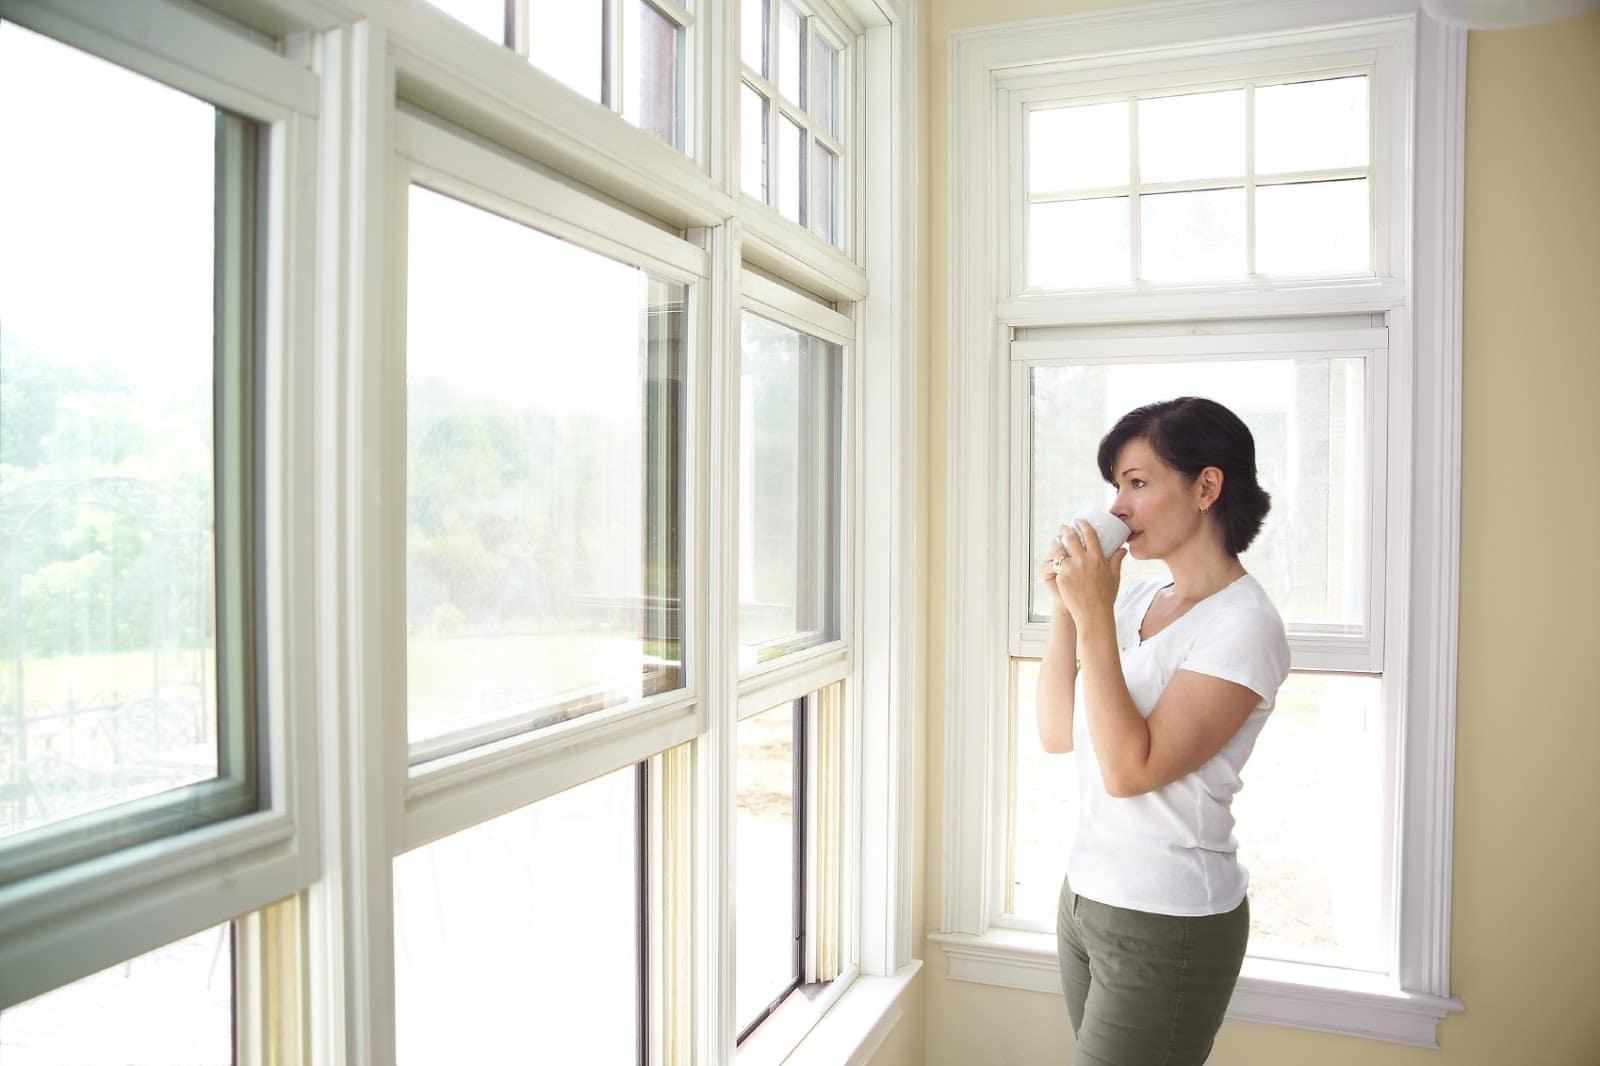 How long do double glazed windows last? Visible damage